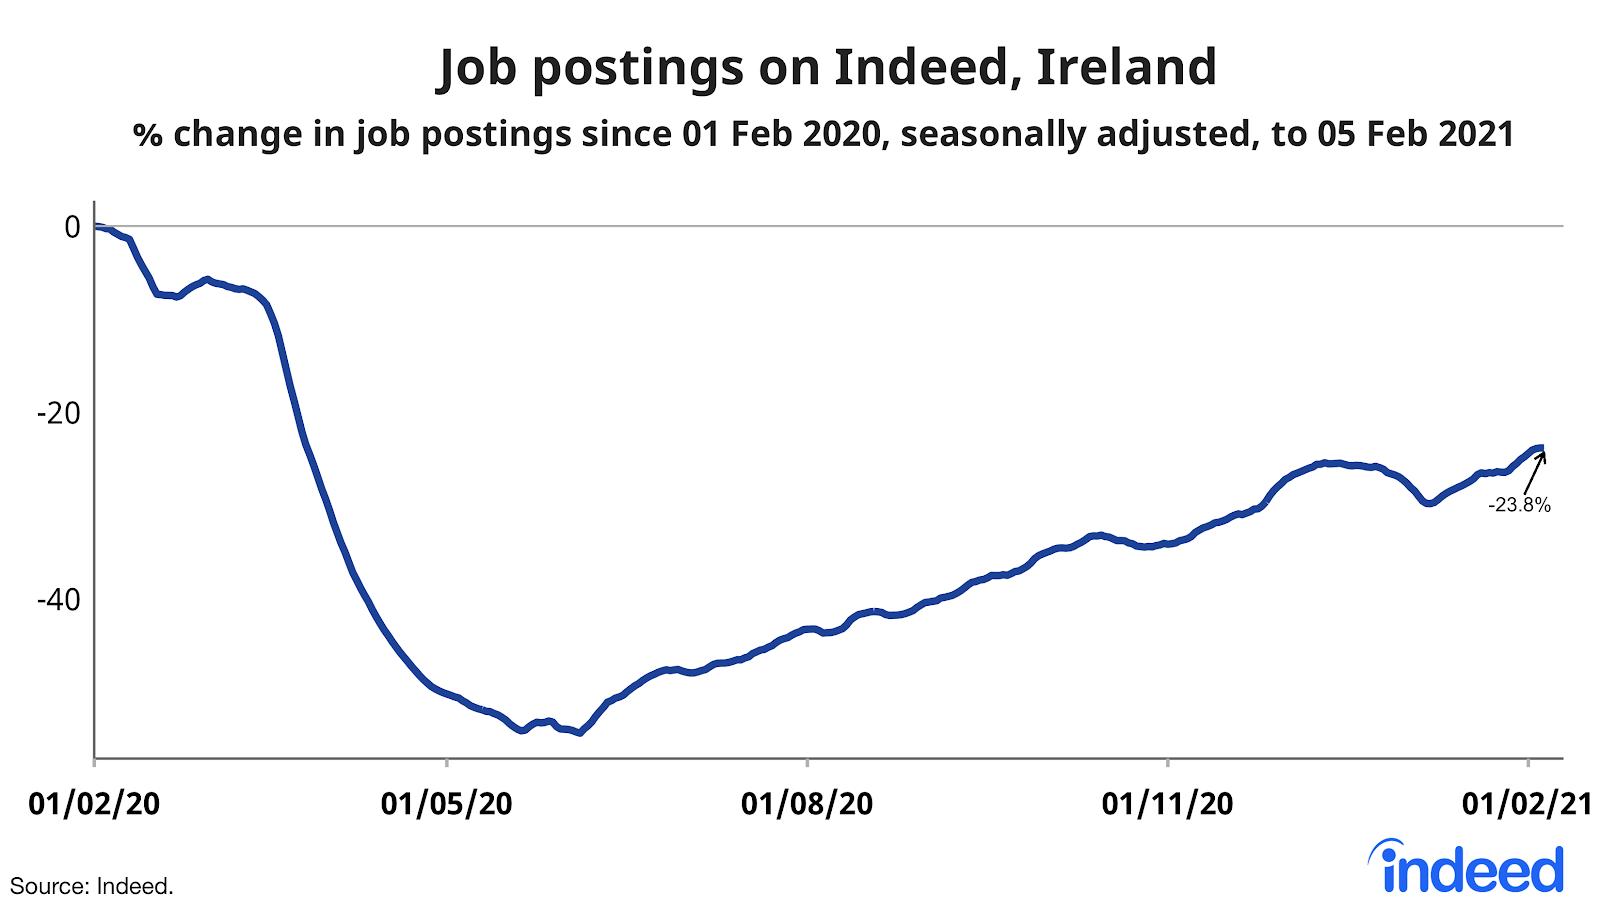 line graph job postings on indeed, ireland